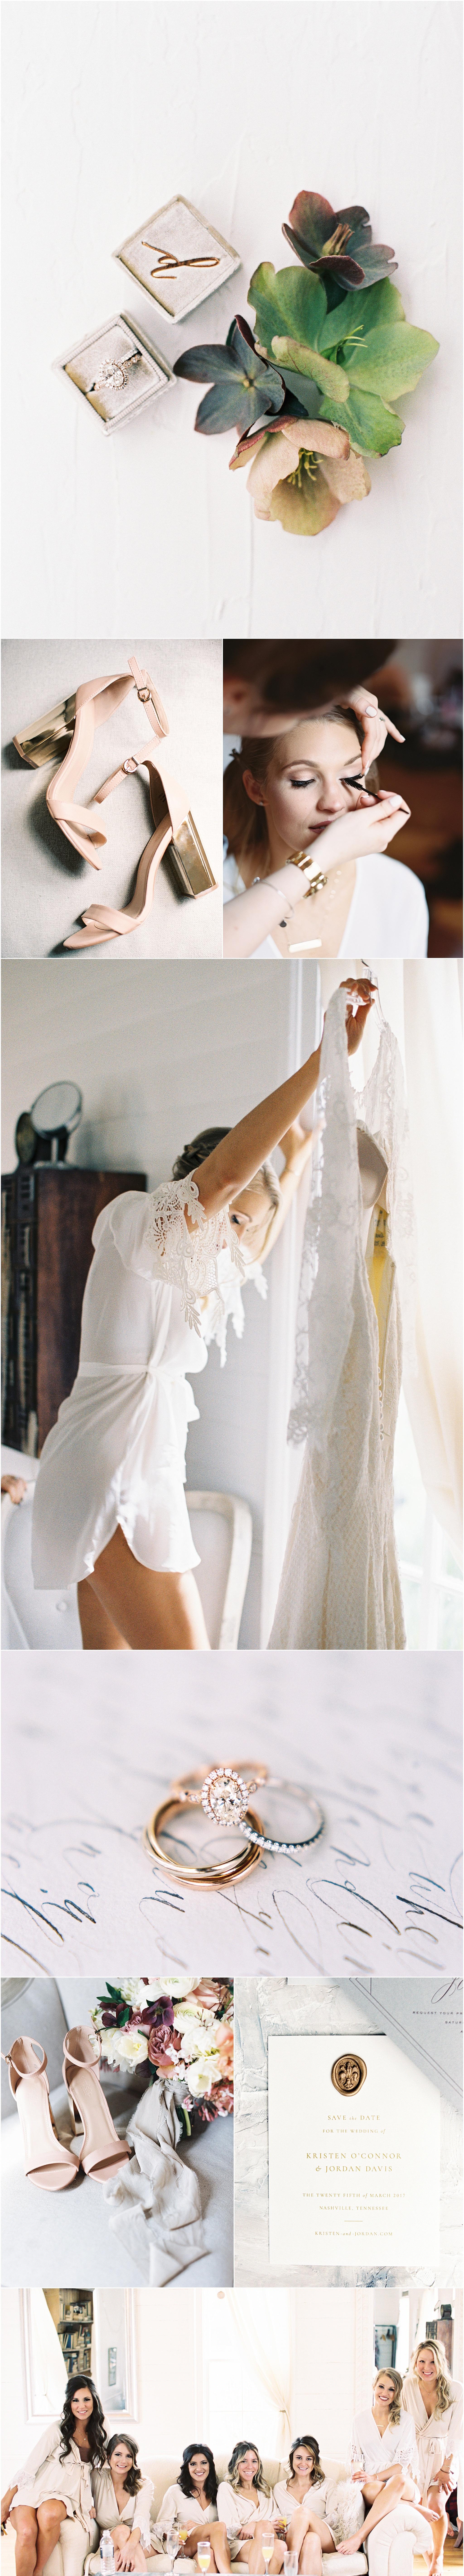 Nashville wedding photographer Sarah Ingram